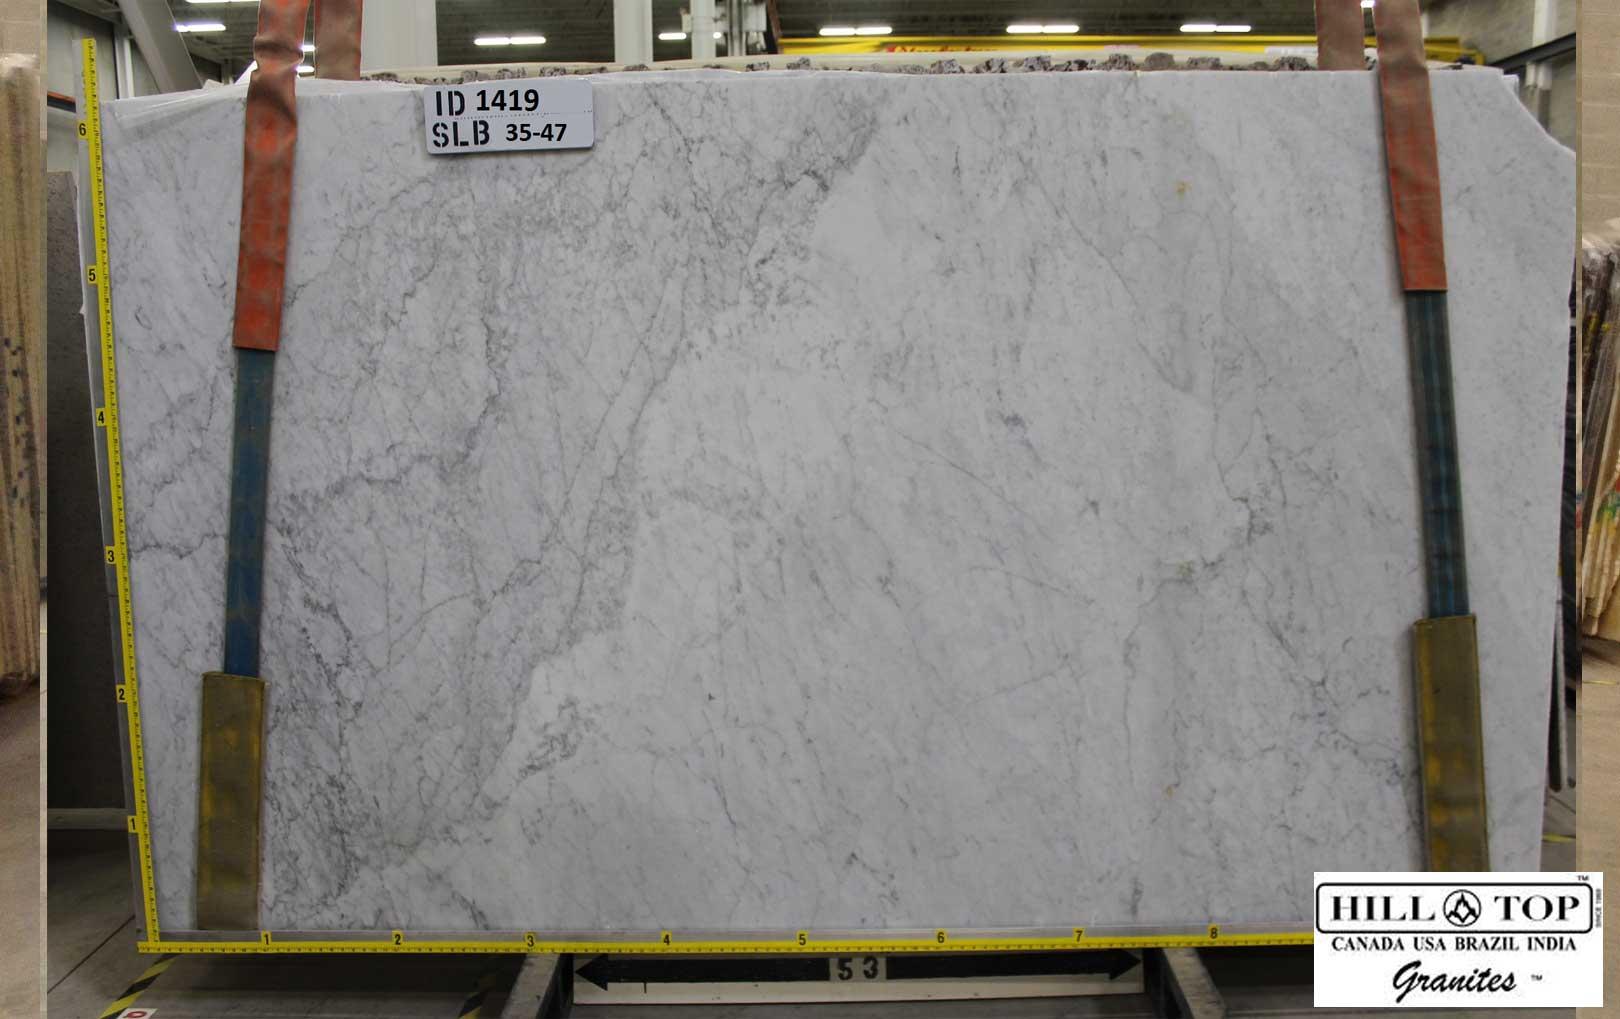 Hilltop Granite USA